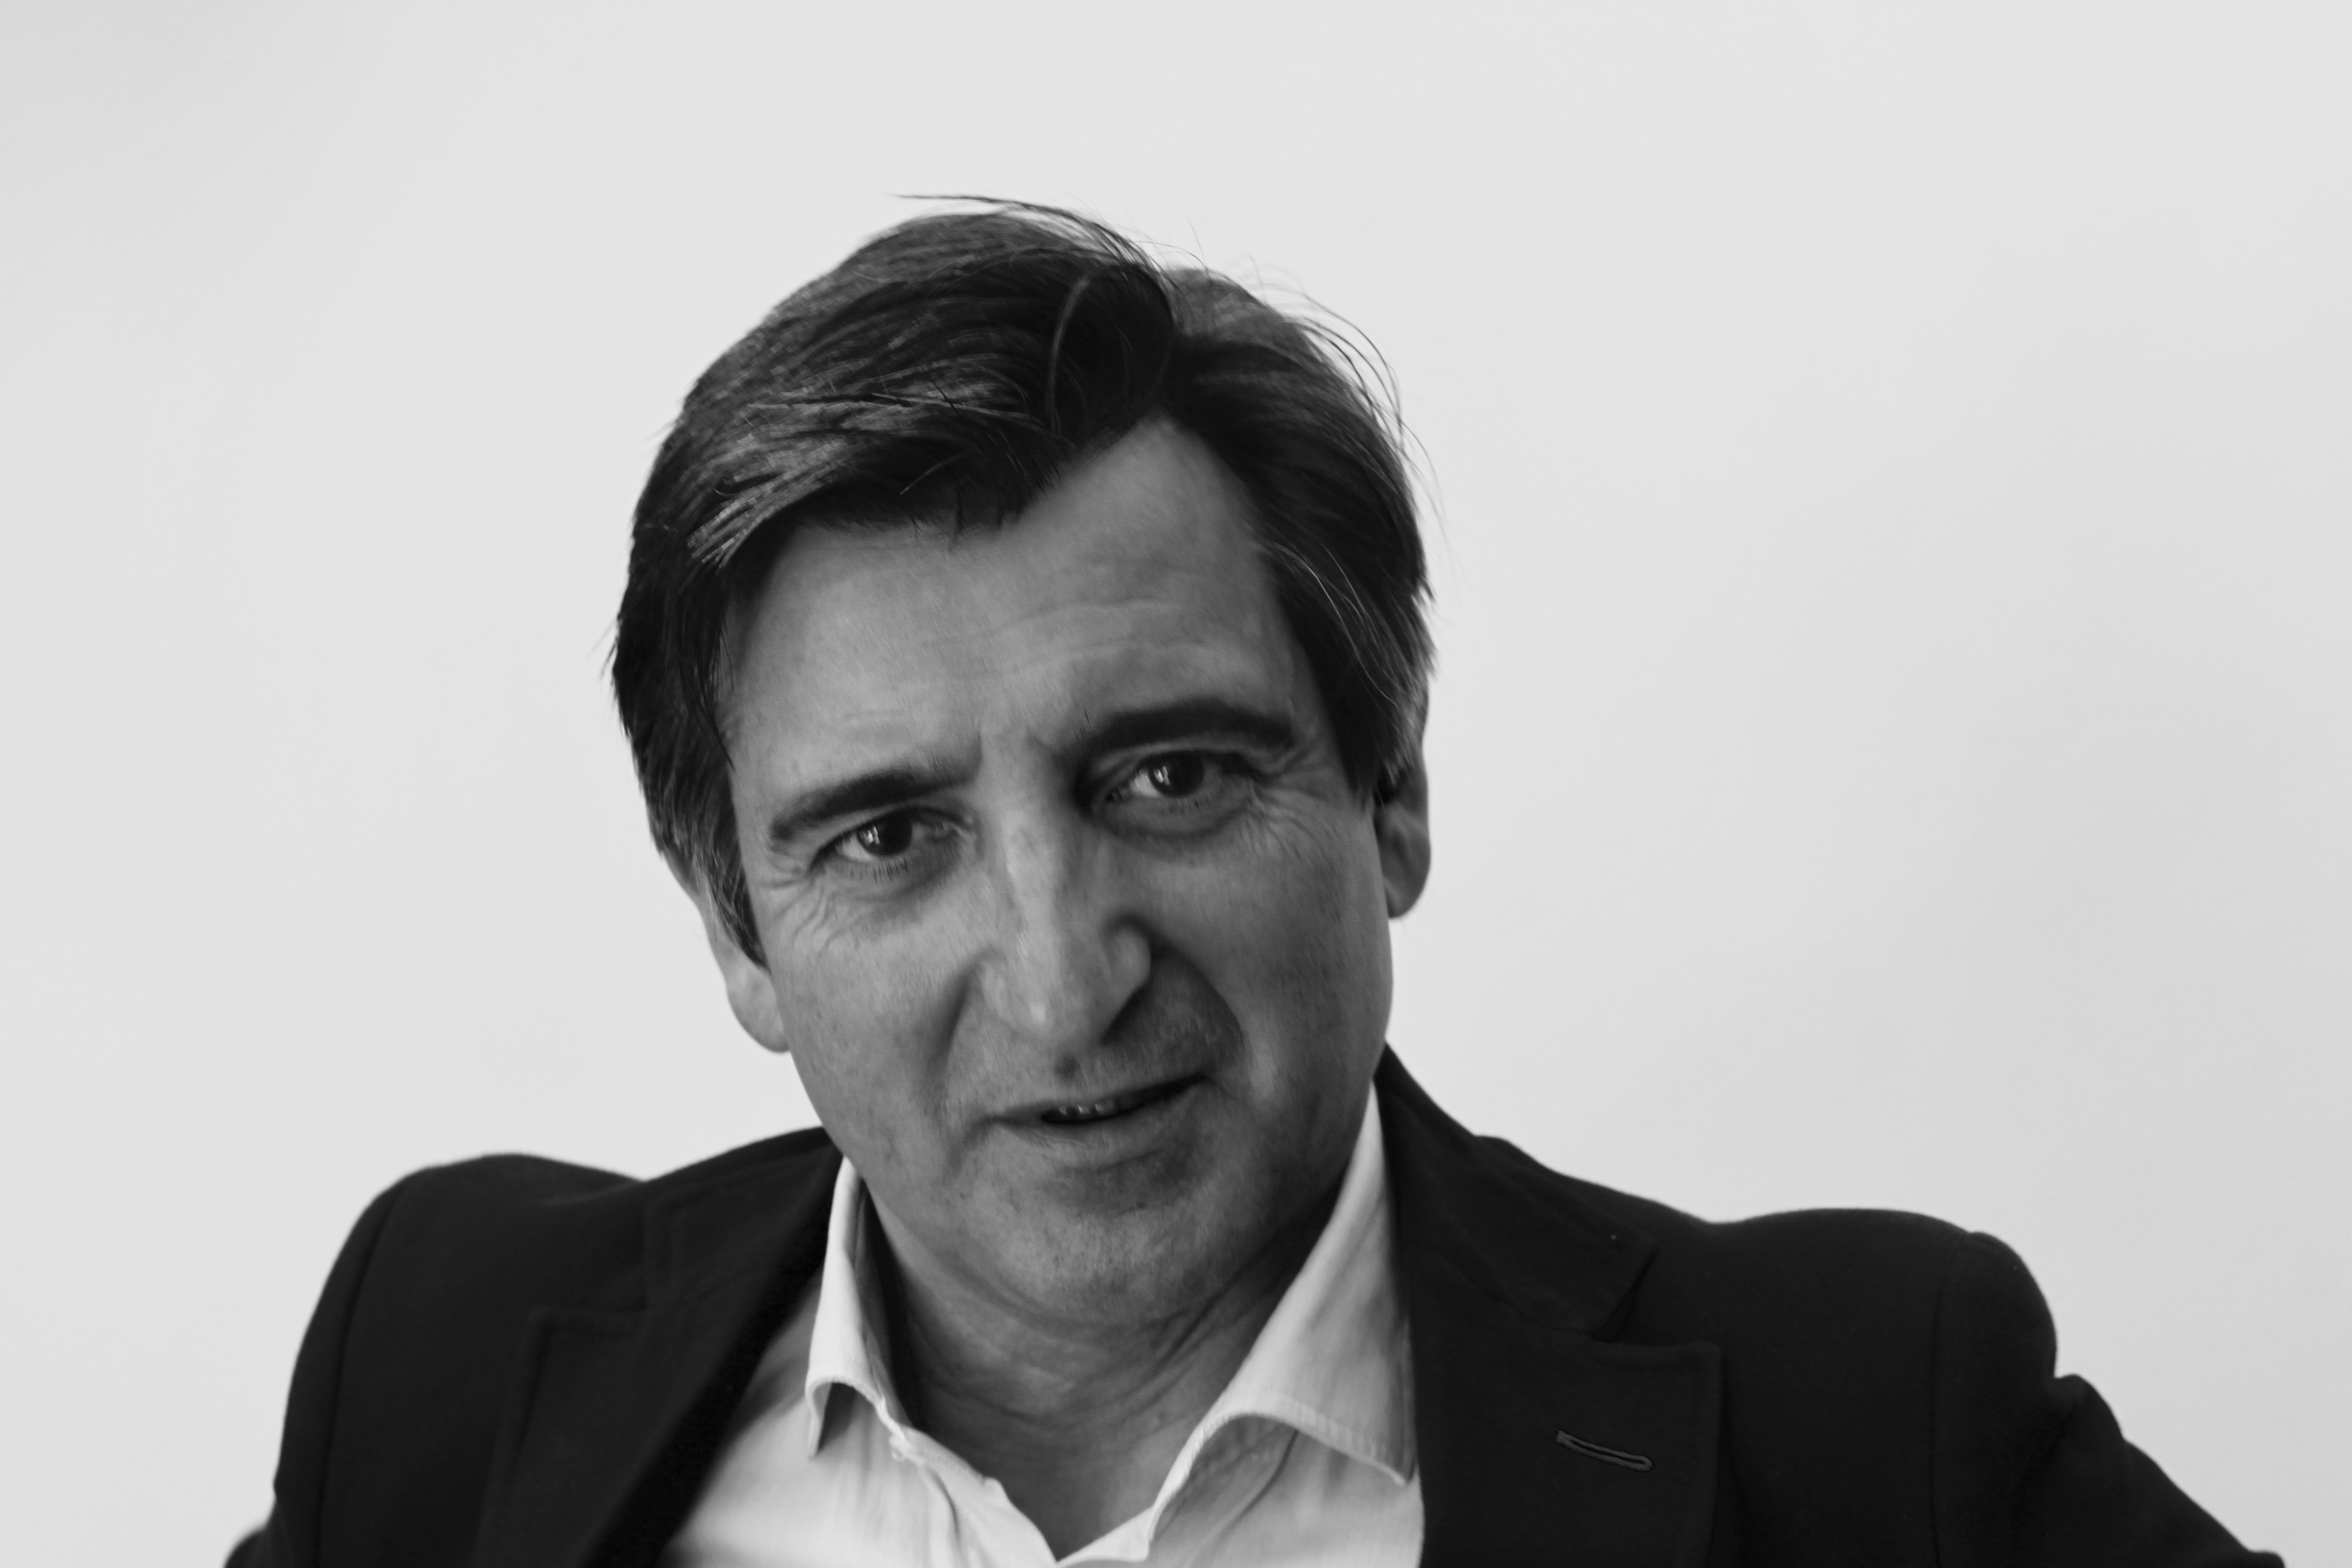 Javier Kessler Saiz